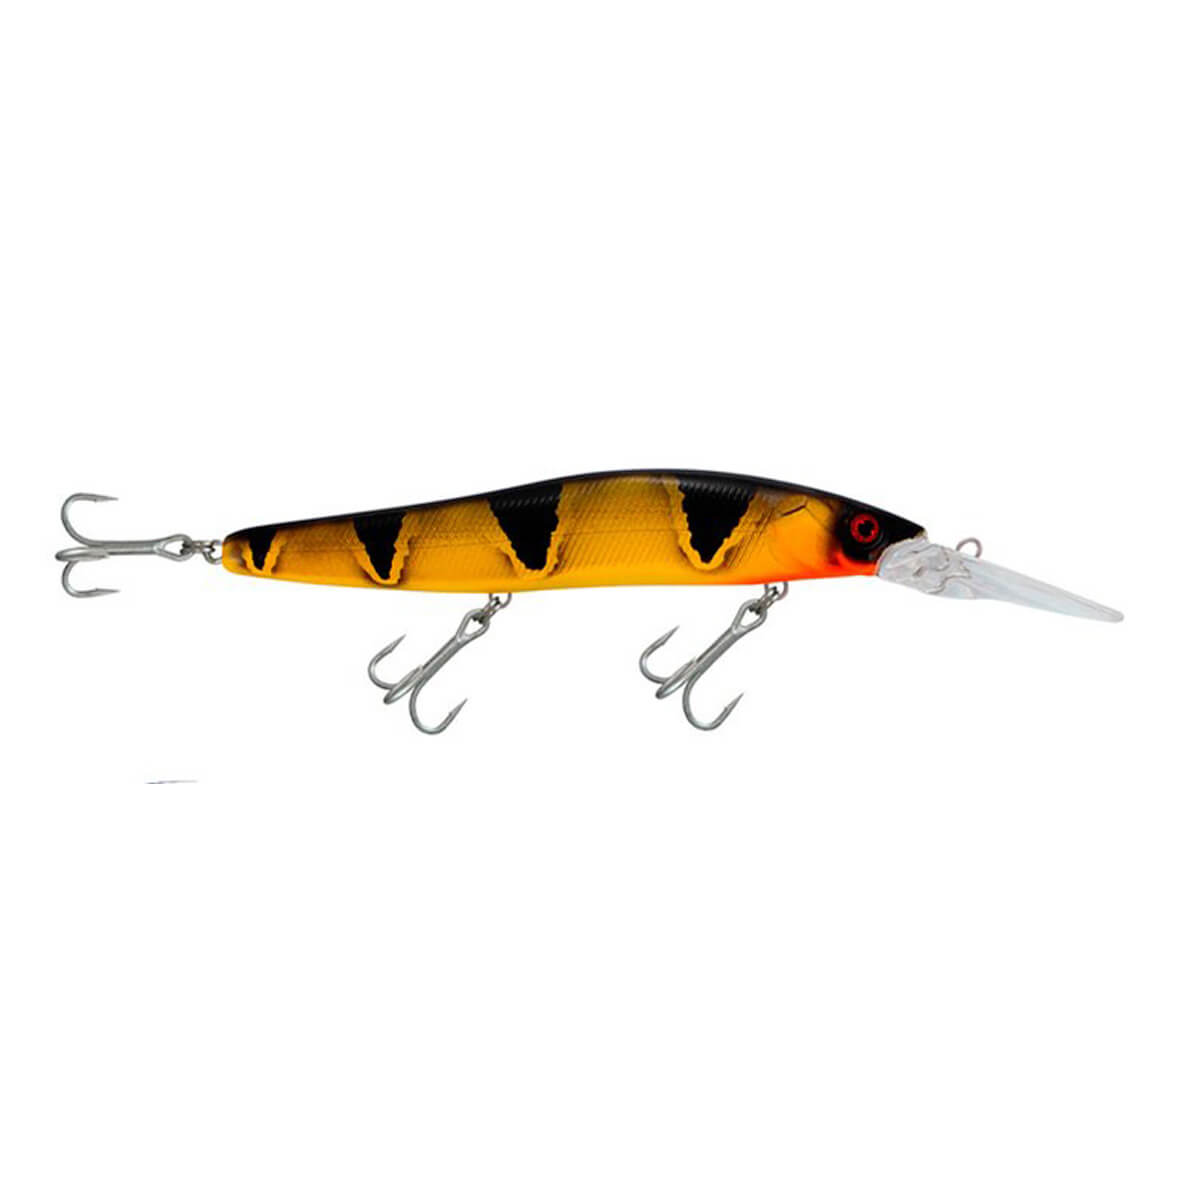 Isca Artificial Lori Mais 95  - Pró Pesca Shop